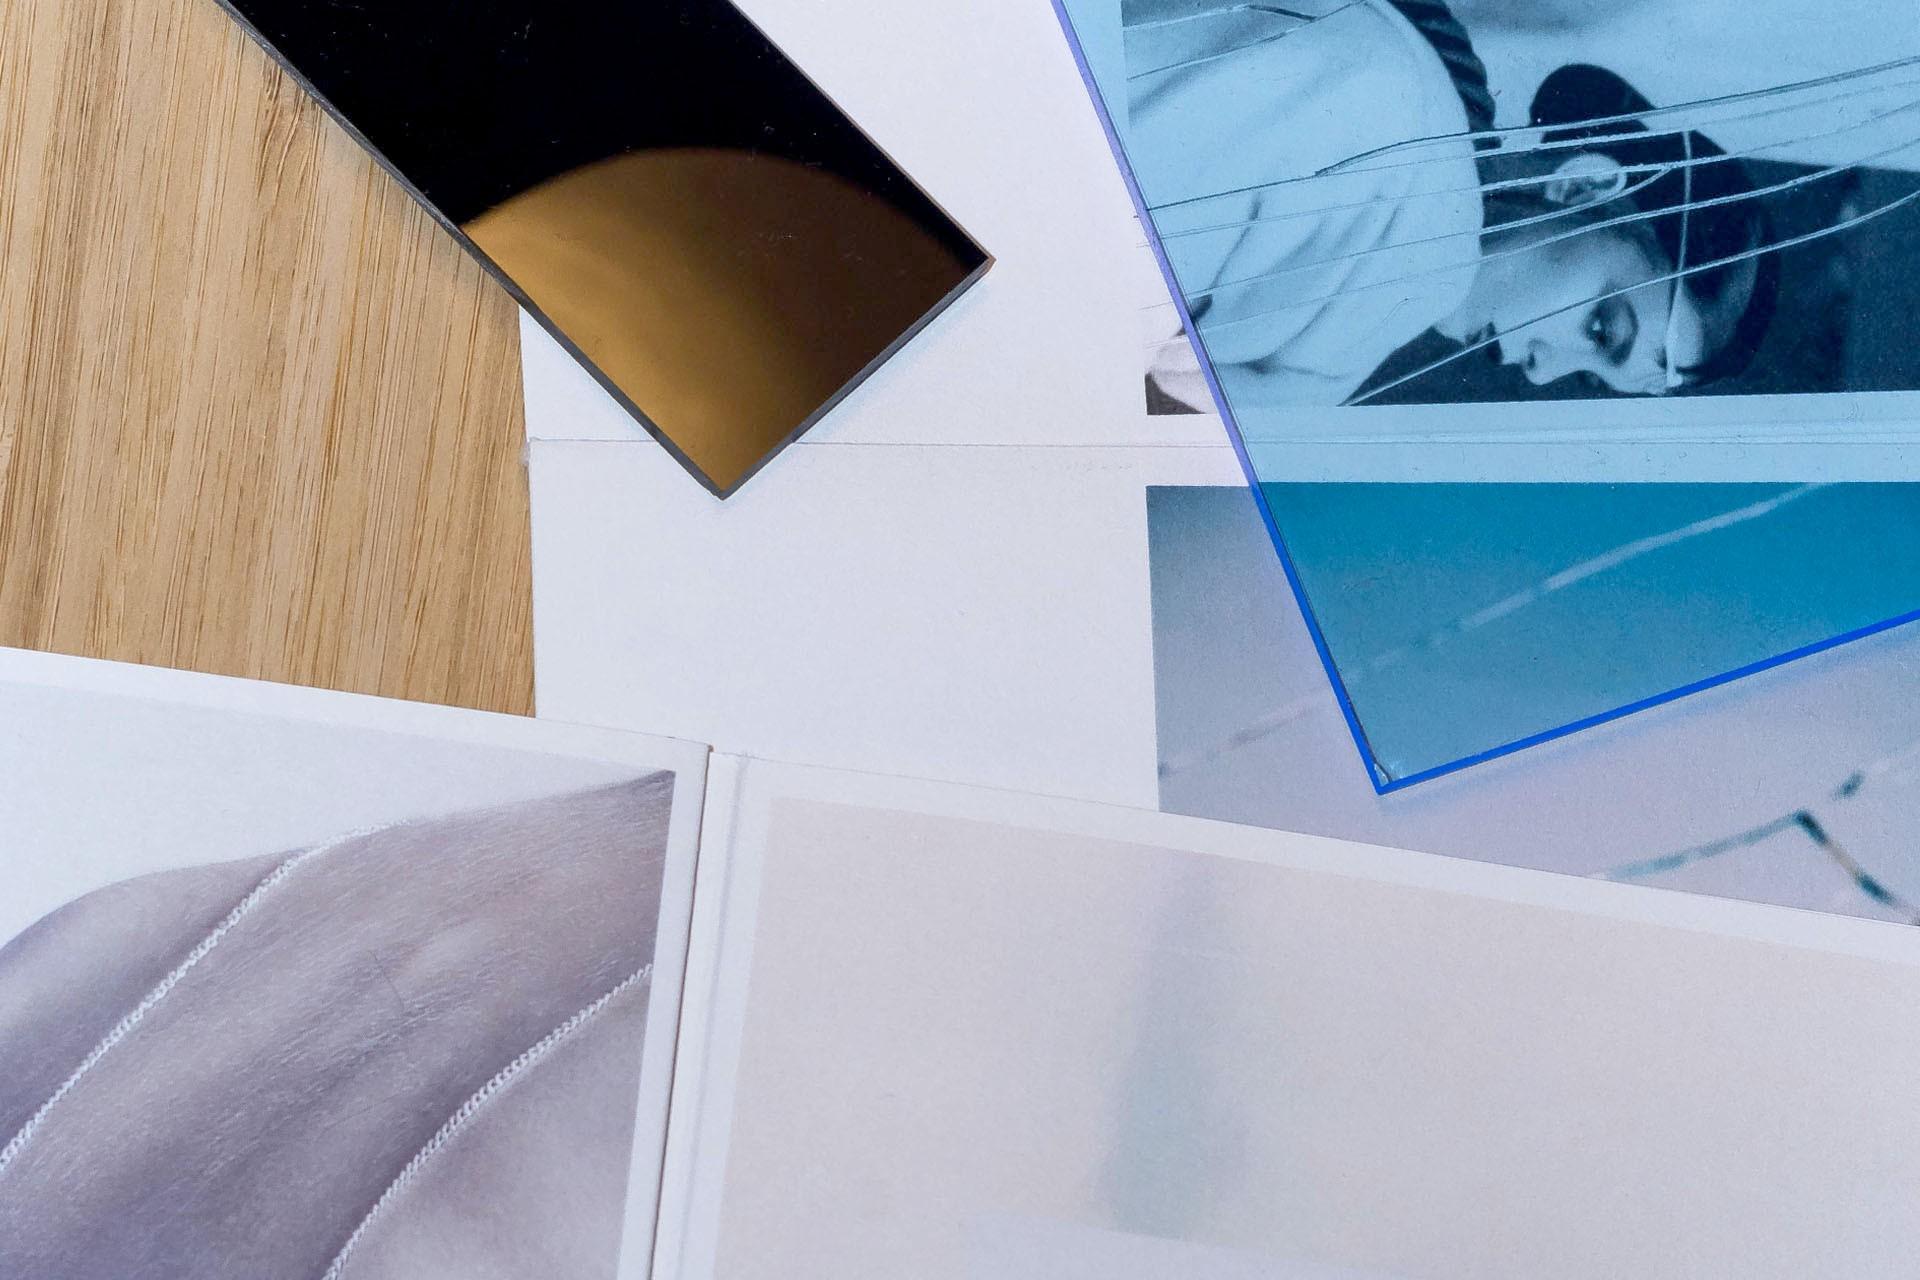 Studio Laura Knoops — Design & Art direction Mies Nobis